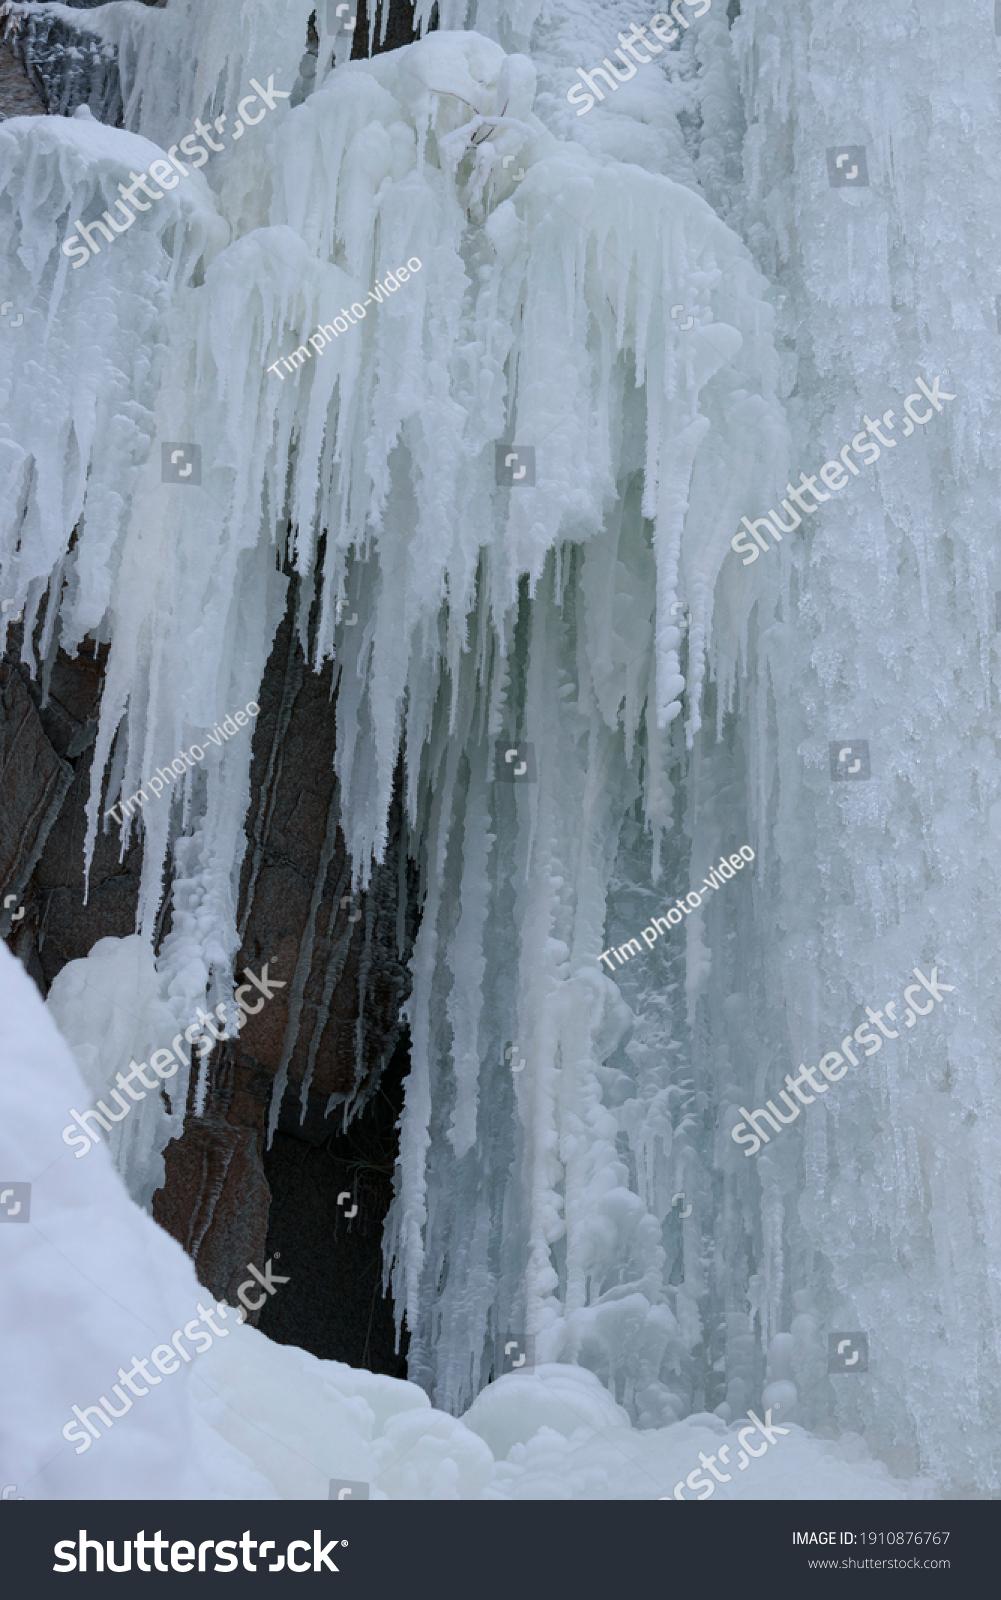 stock-photo-ice-staloctites-descend-from